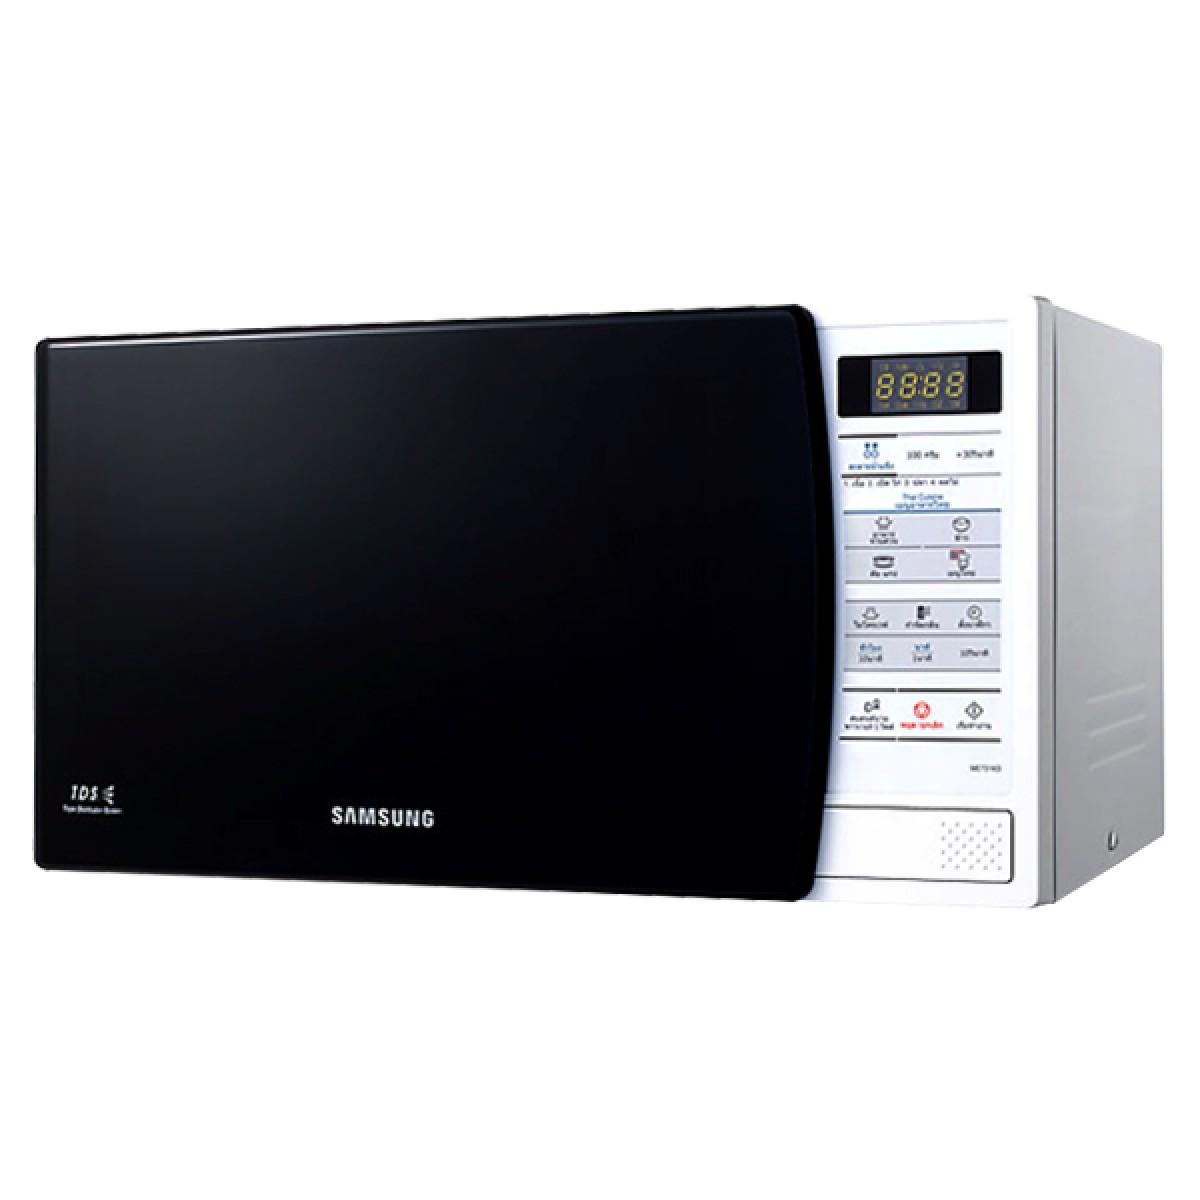 Samsung ME731K Microwave Oven 20L ...